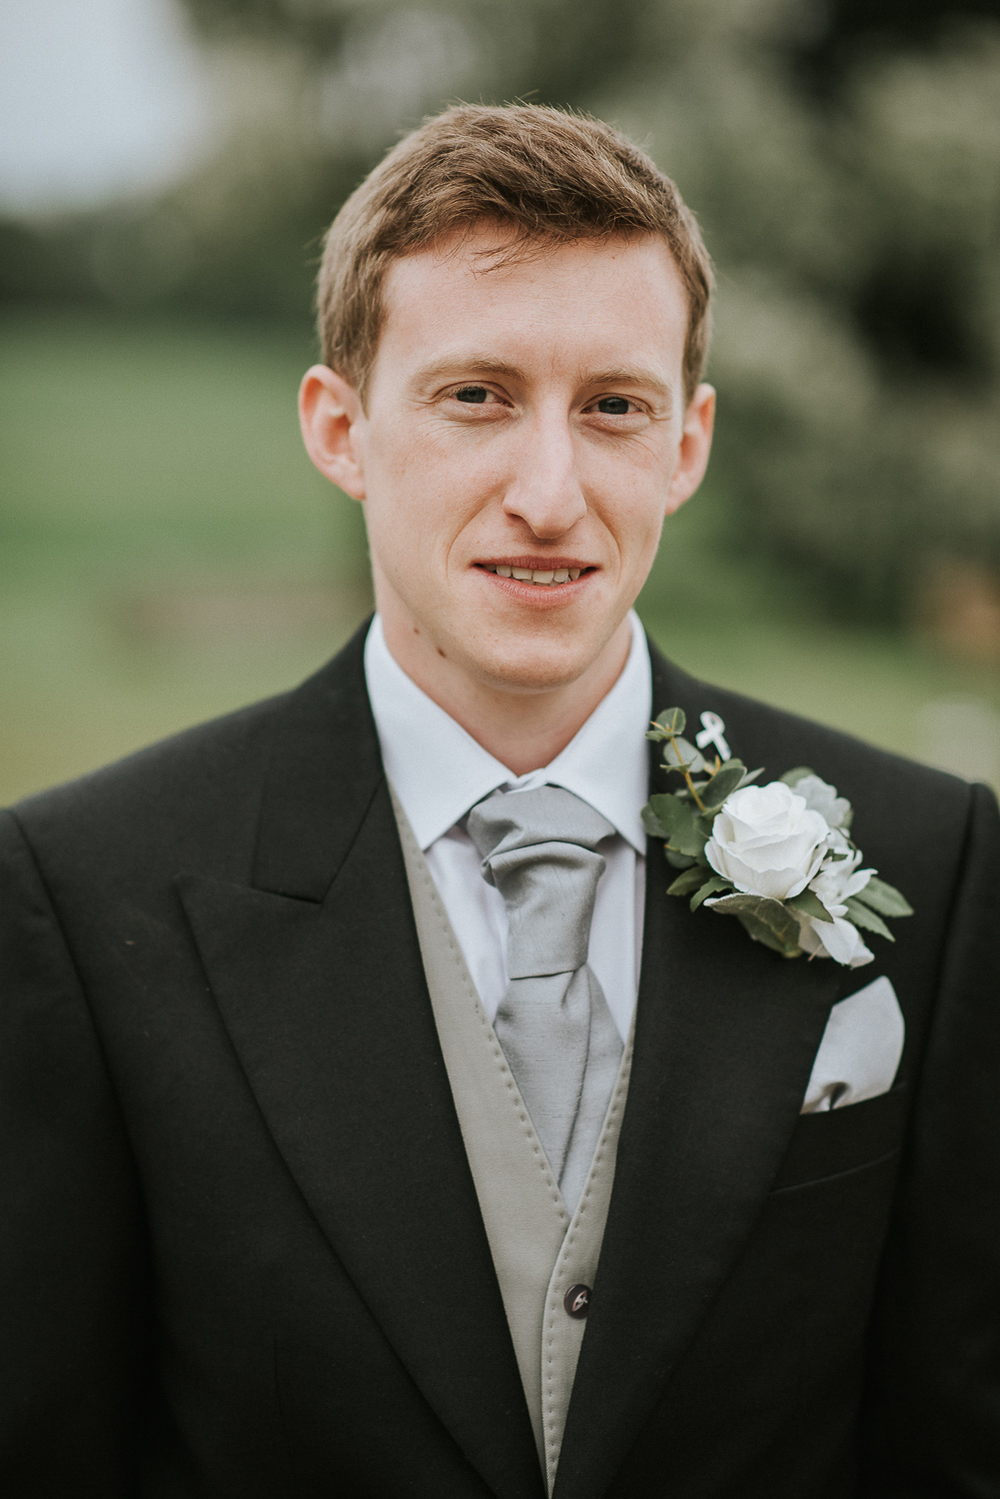 wedding-photographer-cornwall-142.jpg